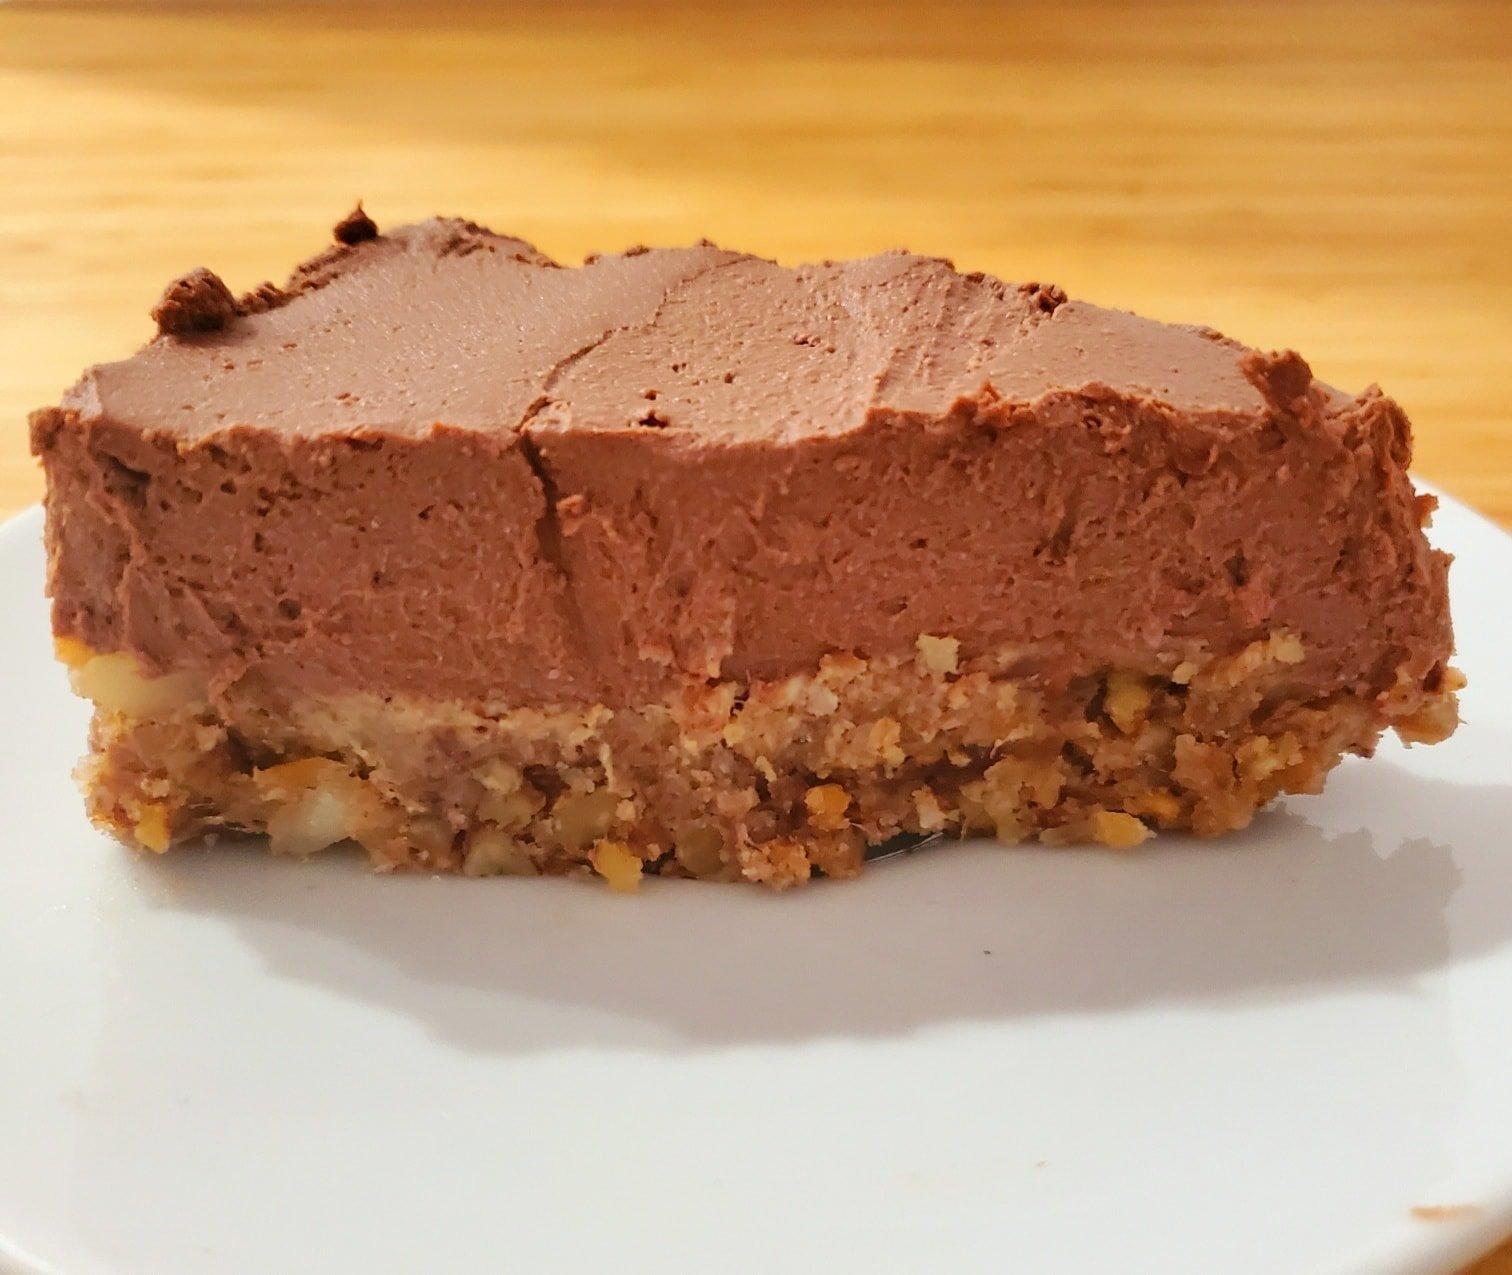 Chocolate Silken Soy Cake